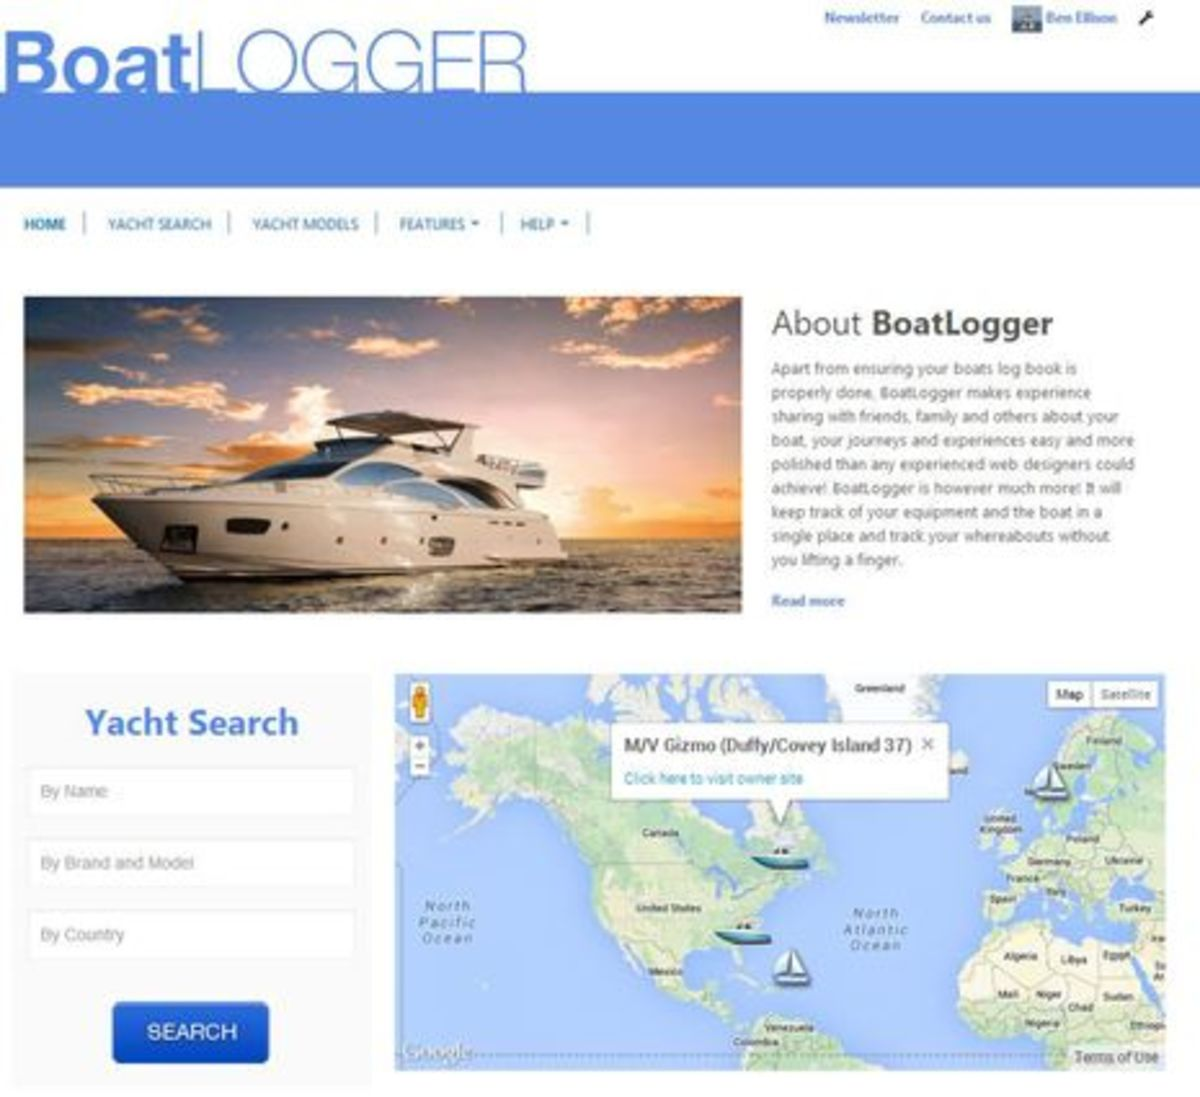 BoatLogger_home_page_beta_begins_cPanbo.jpg